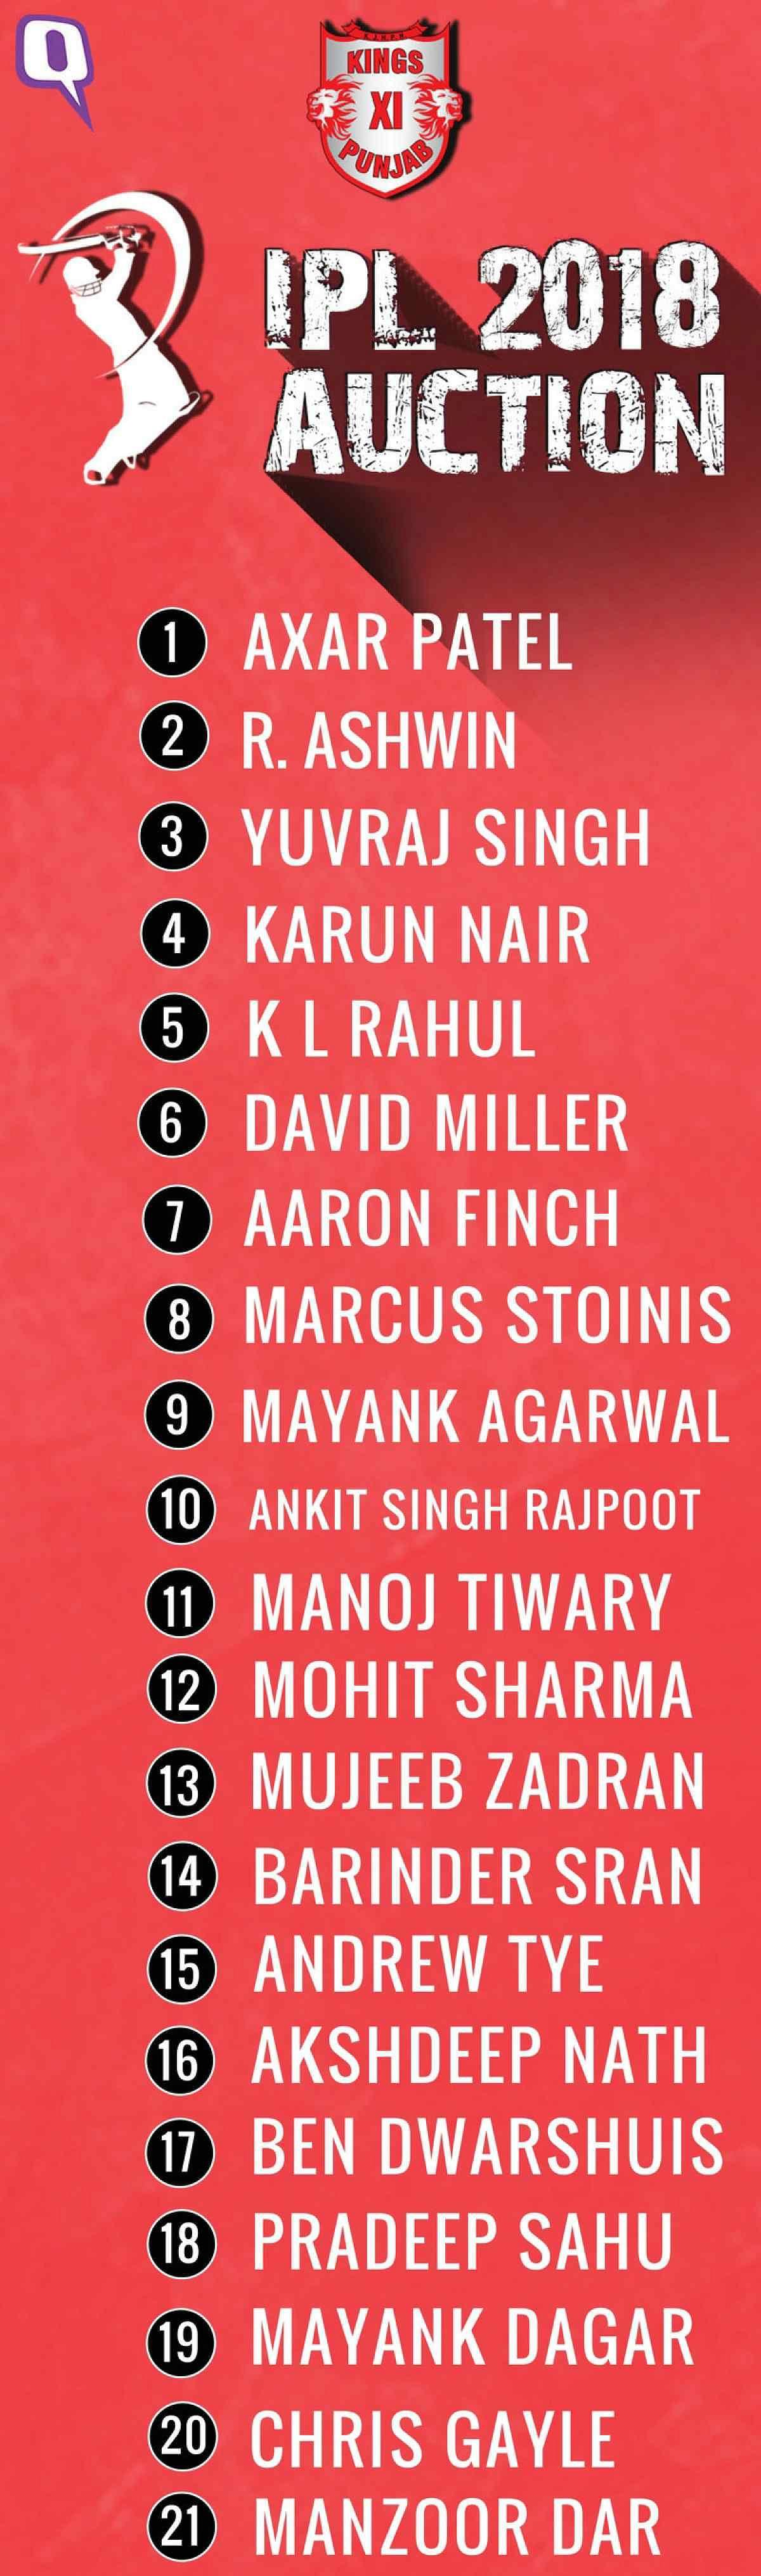 IPL 2018: Ravichandran Ashwin to Lead Kings XI Punjab